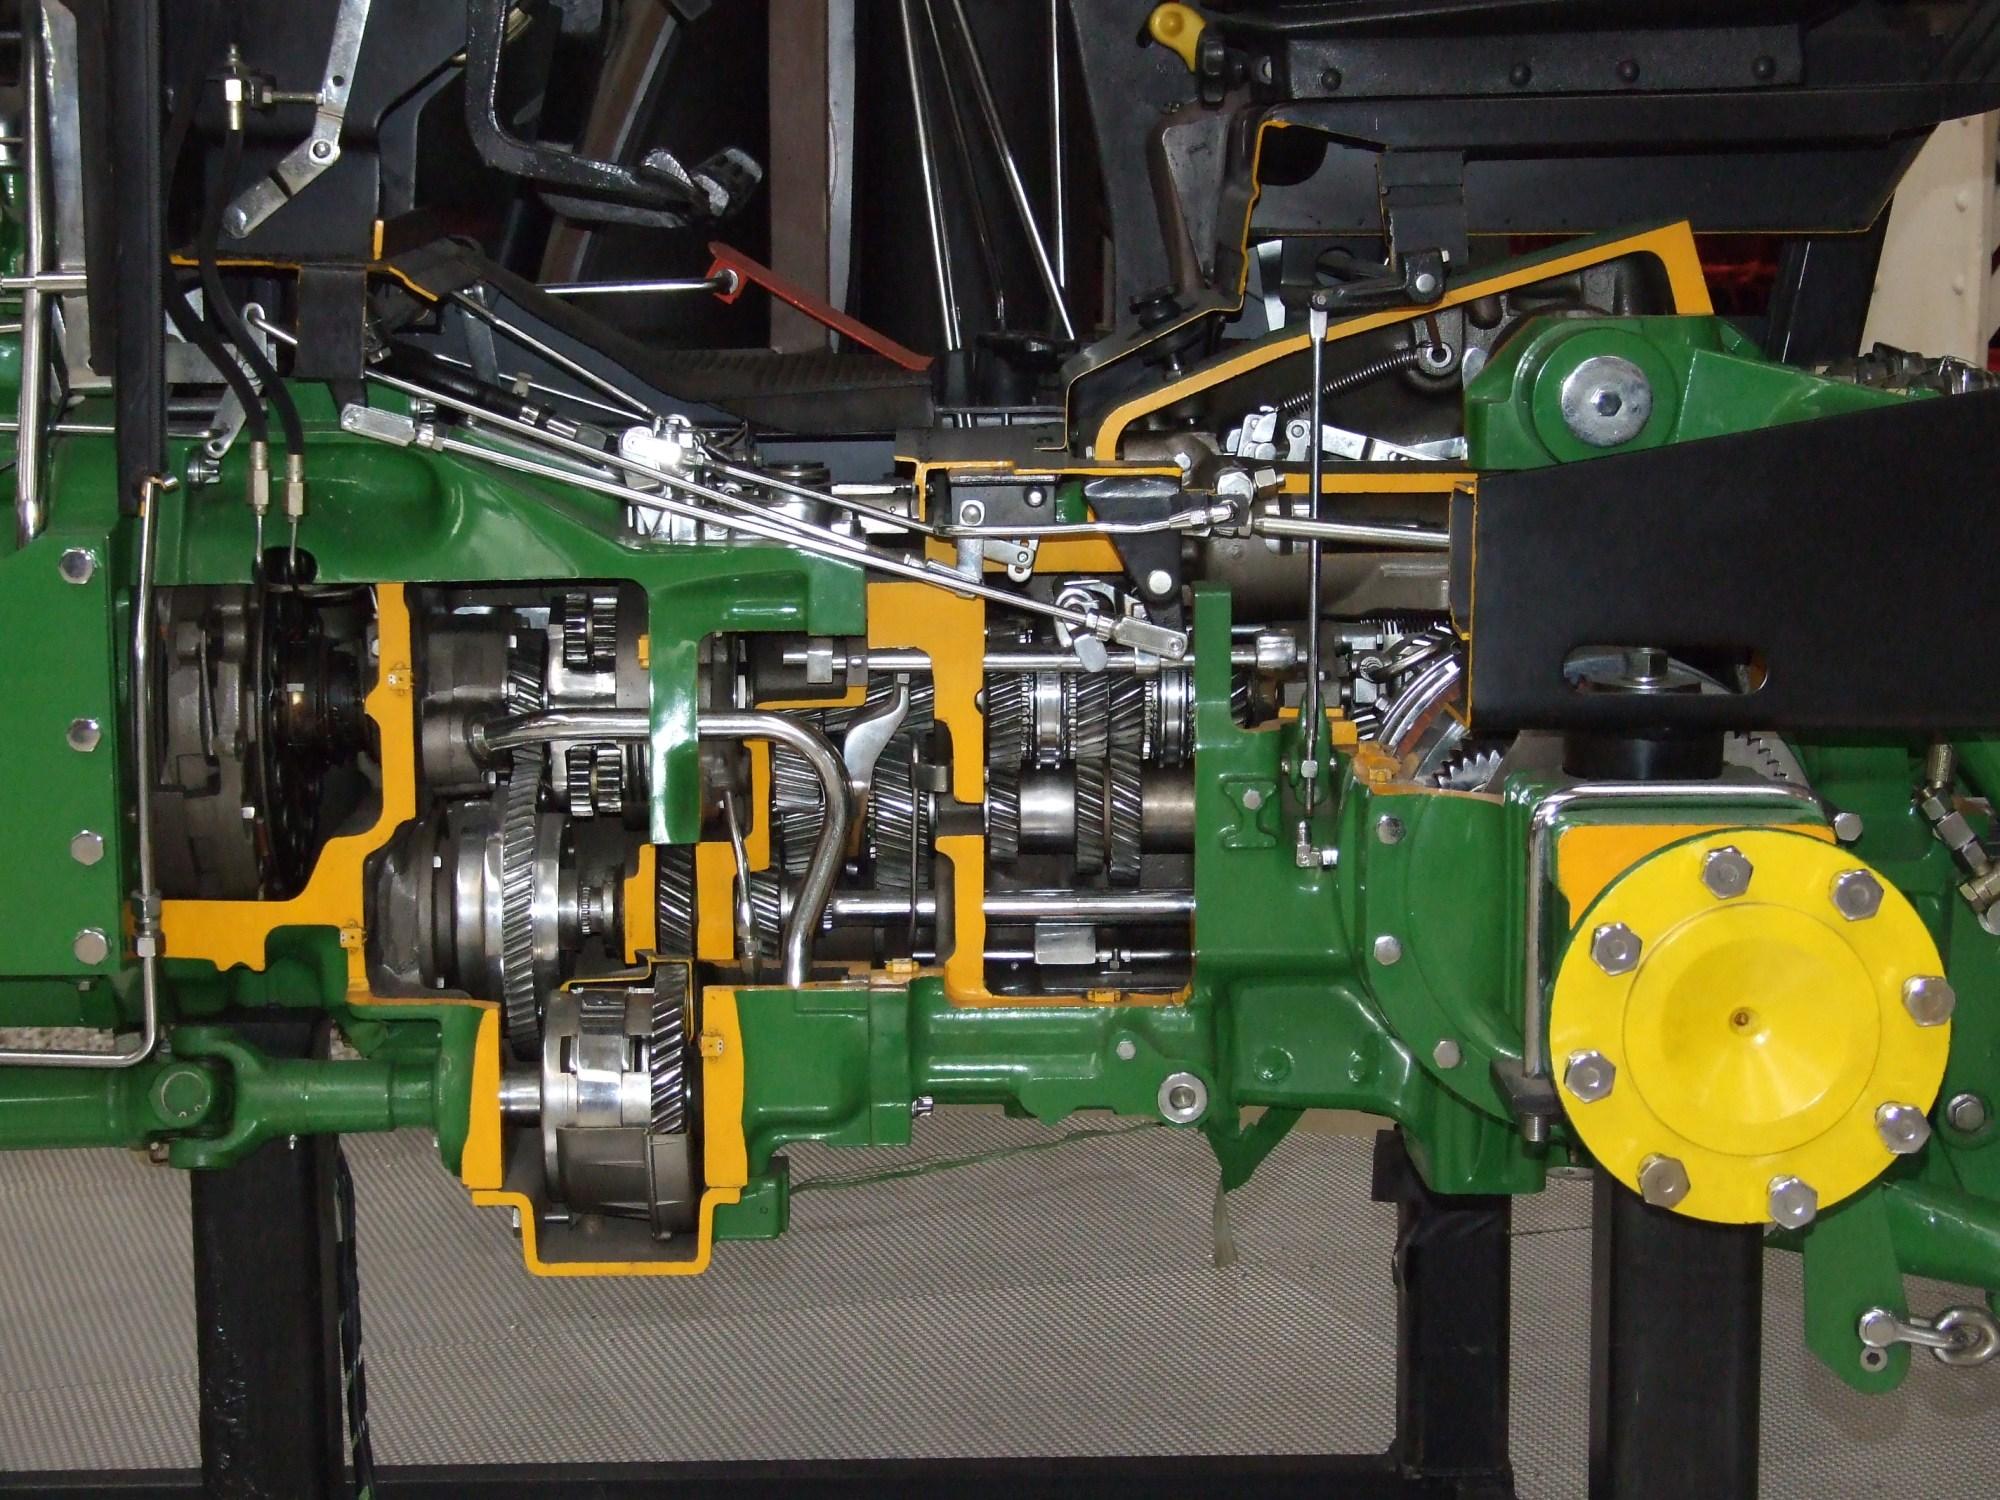 hight resolution of file john deere 3350 tractor cut transmission jpg